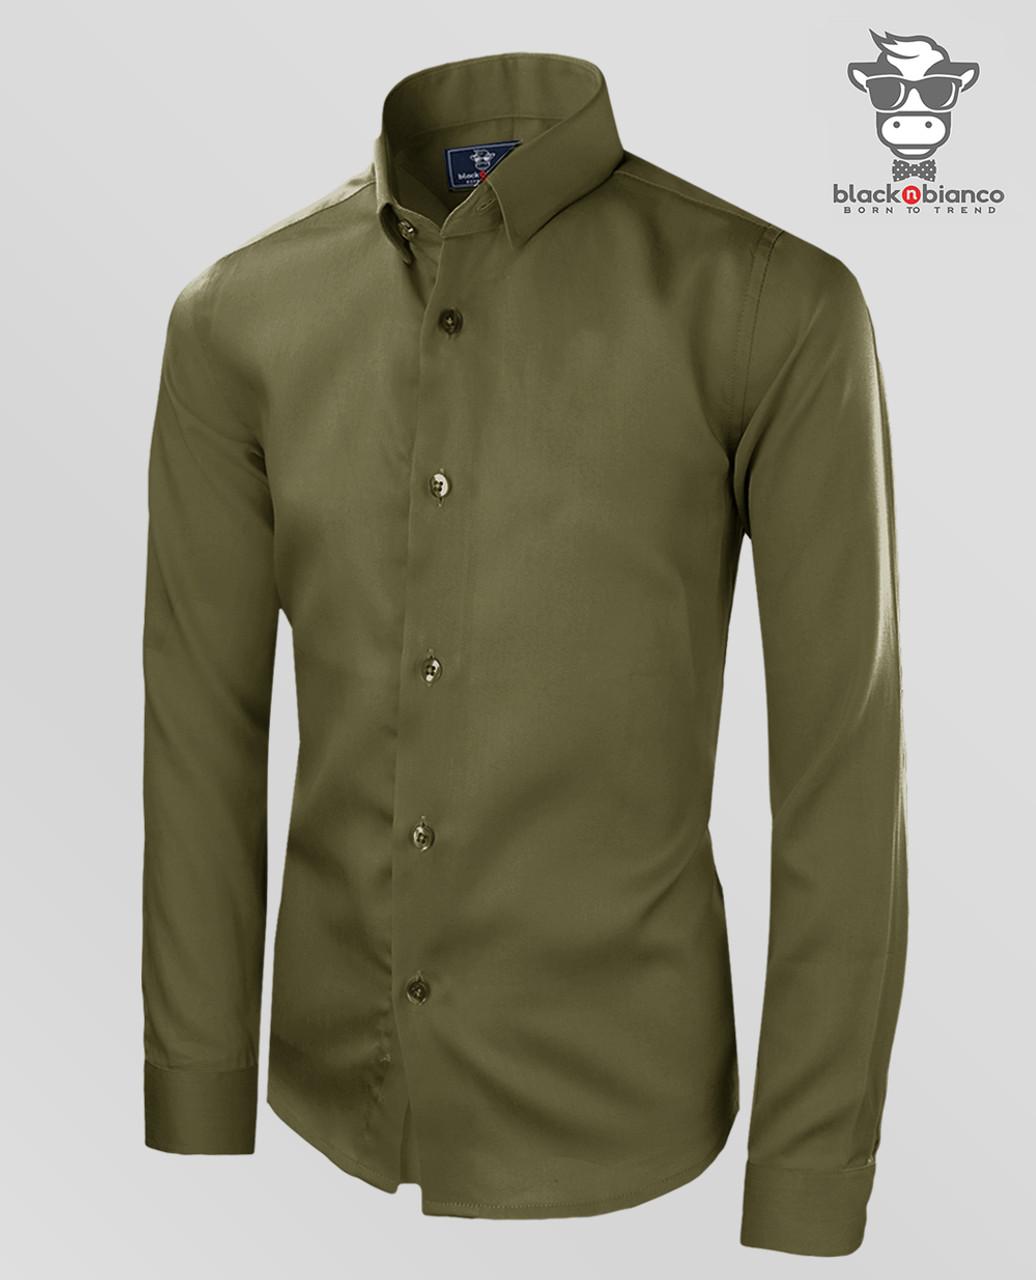 NEW BOYS Light Olive LONG Sleeve Dress Shirt 4~20 ALL SIZES